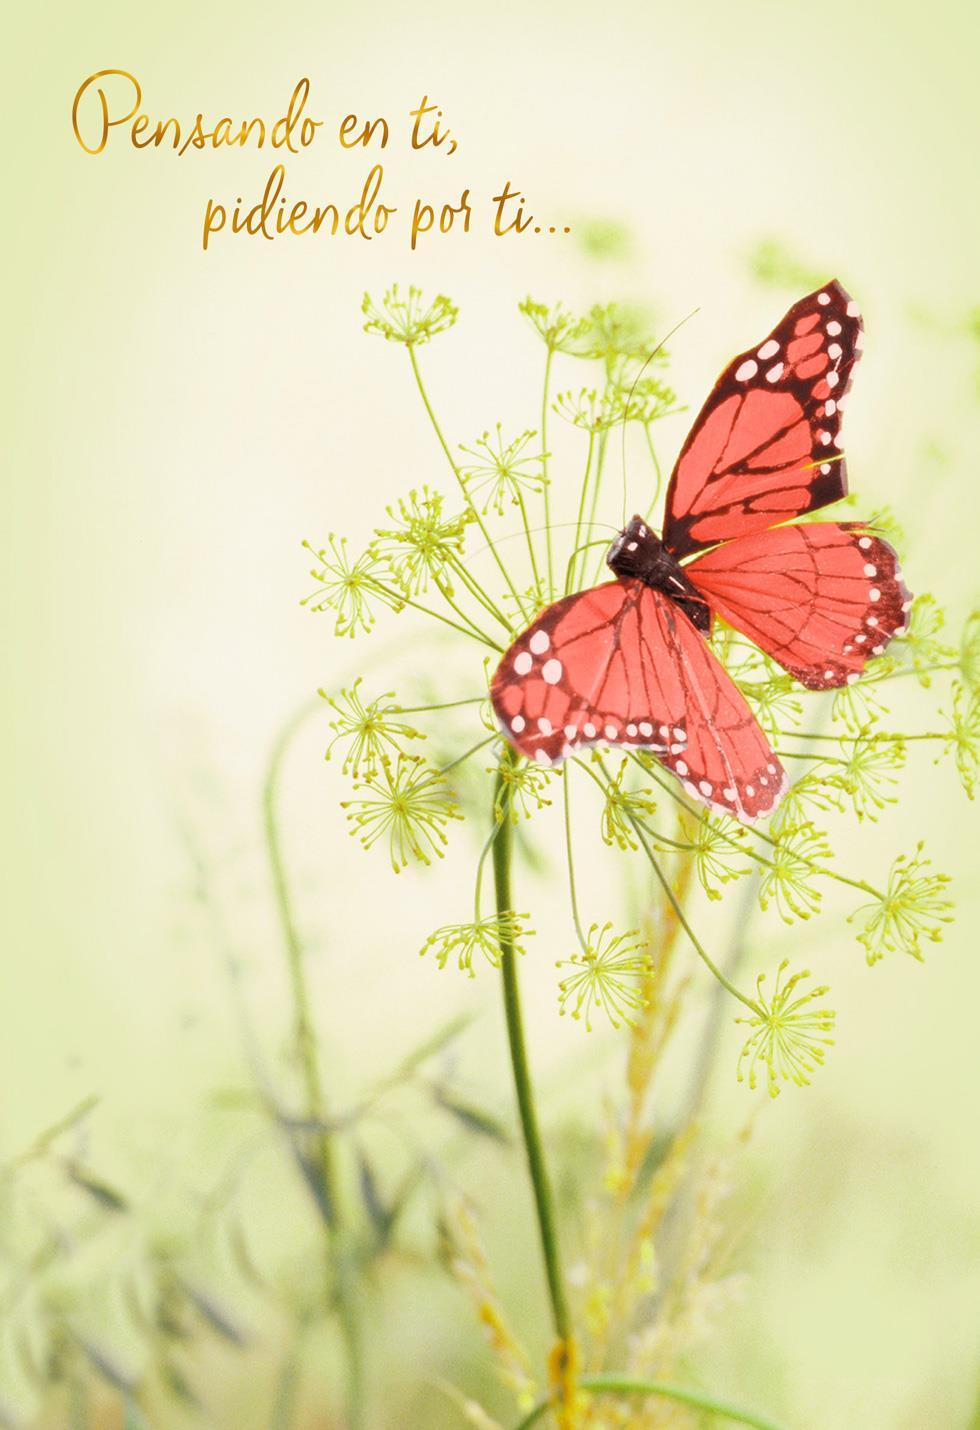 Wishing You Peace Spanish Language Sympathy Card